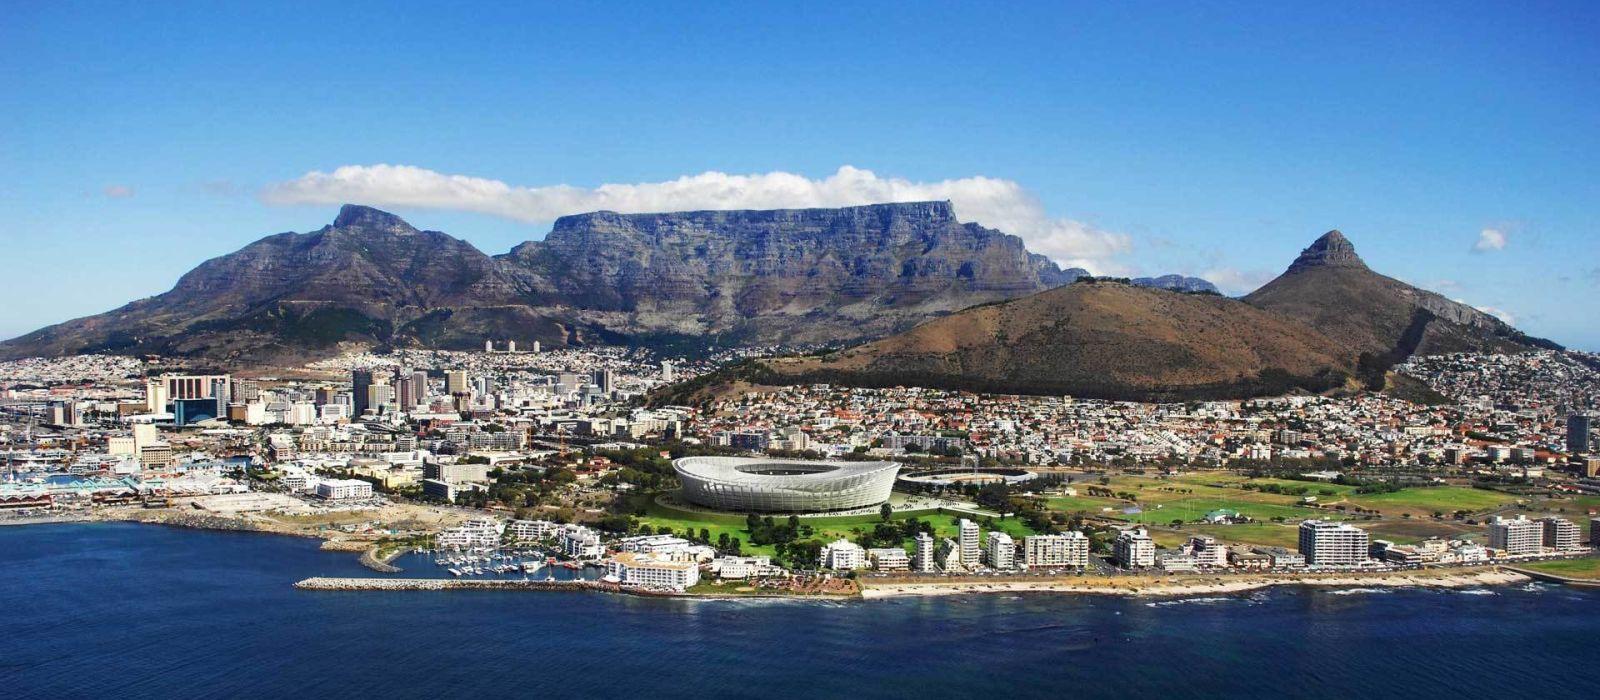 Südafrika: Kapstadt, Westkap und Krüger Nationalpark Urlaub 5